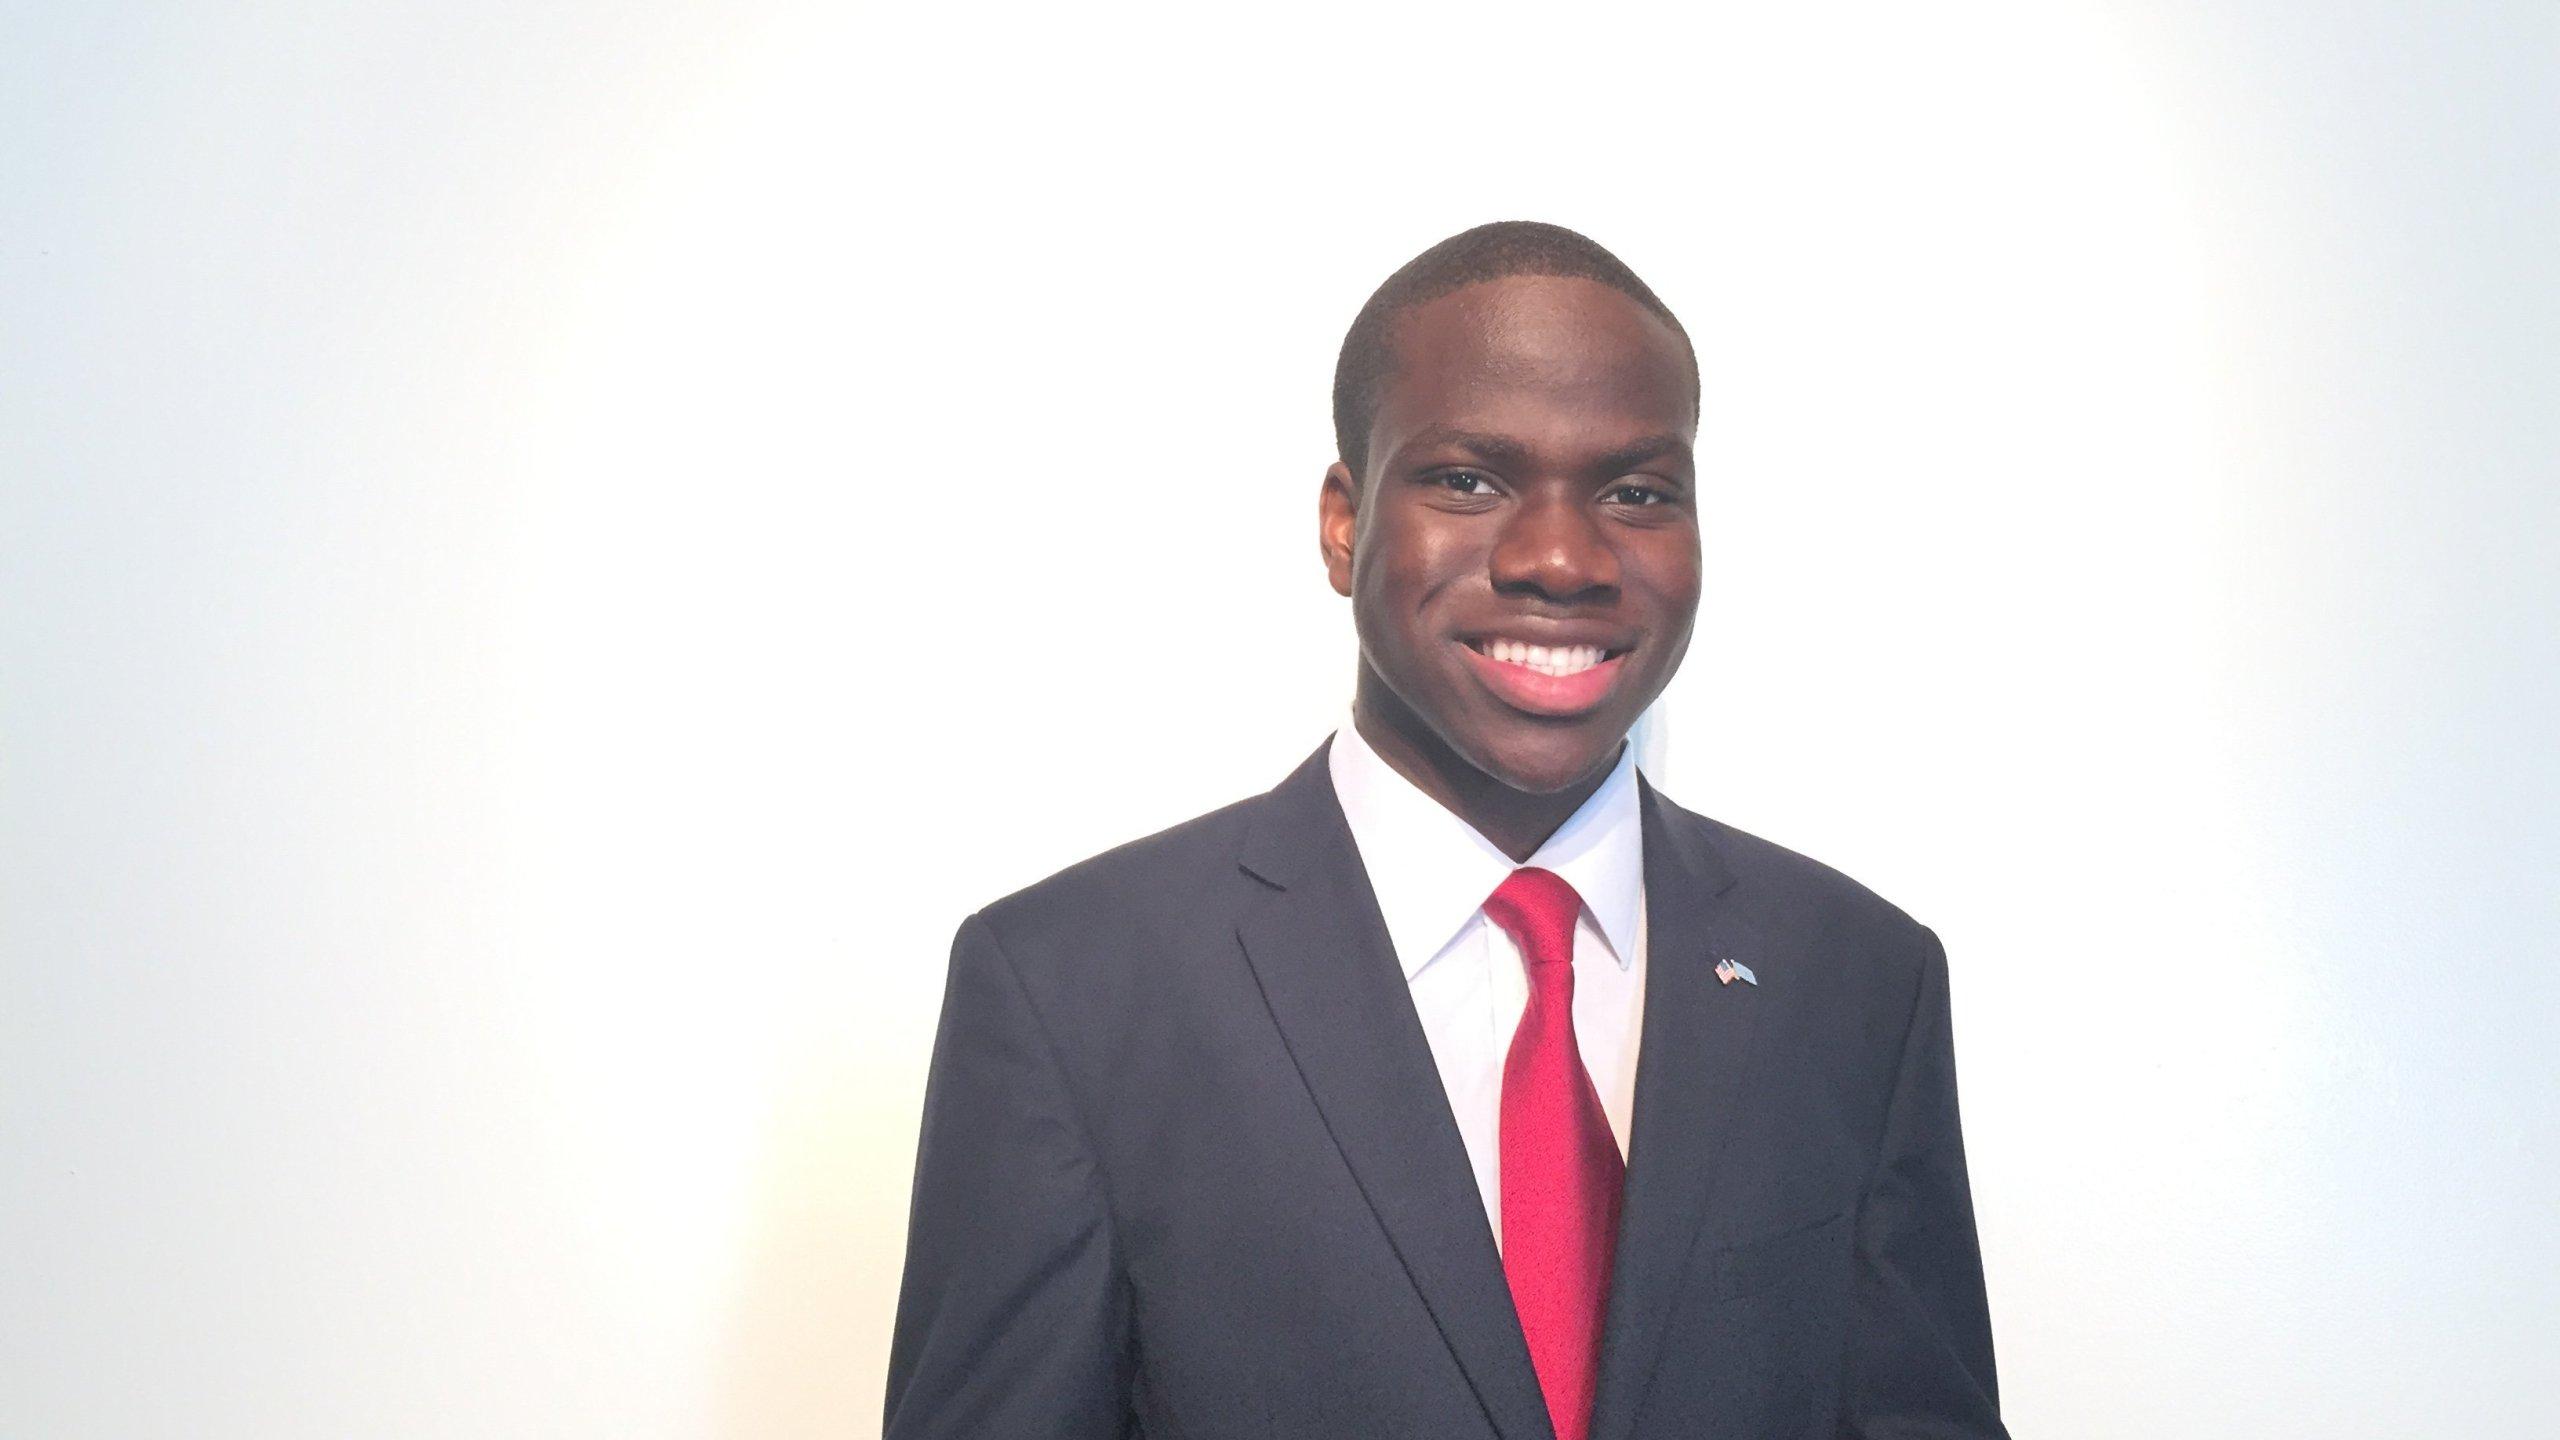 Harold Ekeh is a senior at Elmont Memorial High School in Elmont, New York.